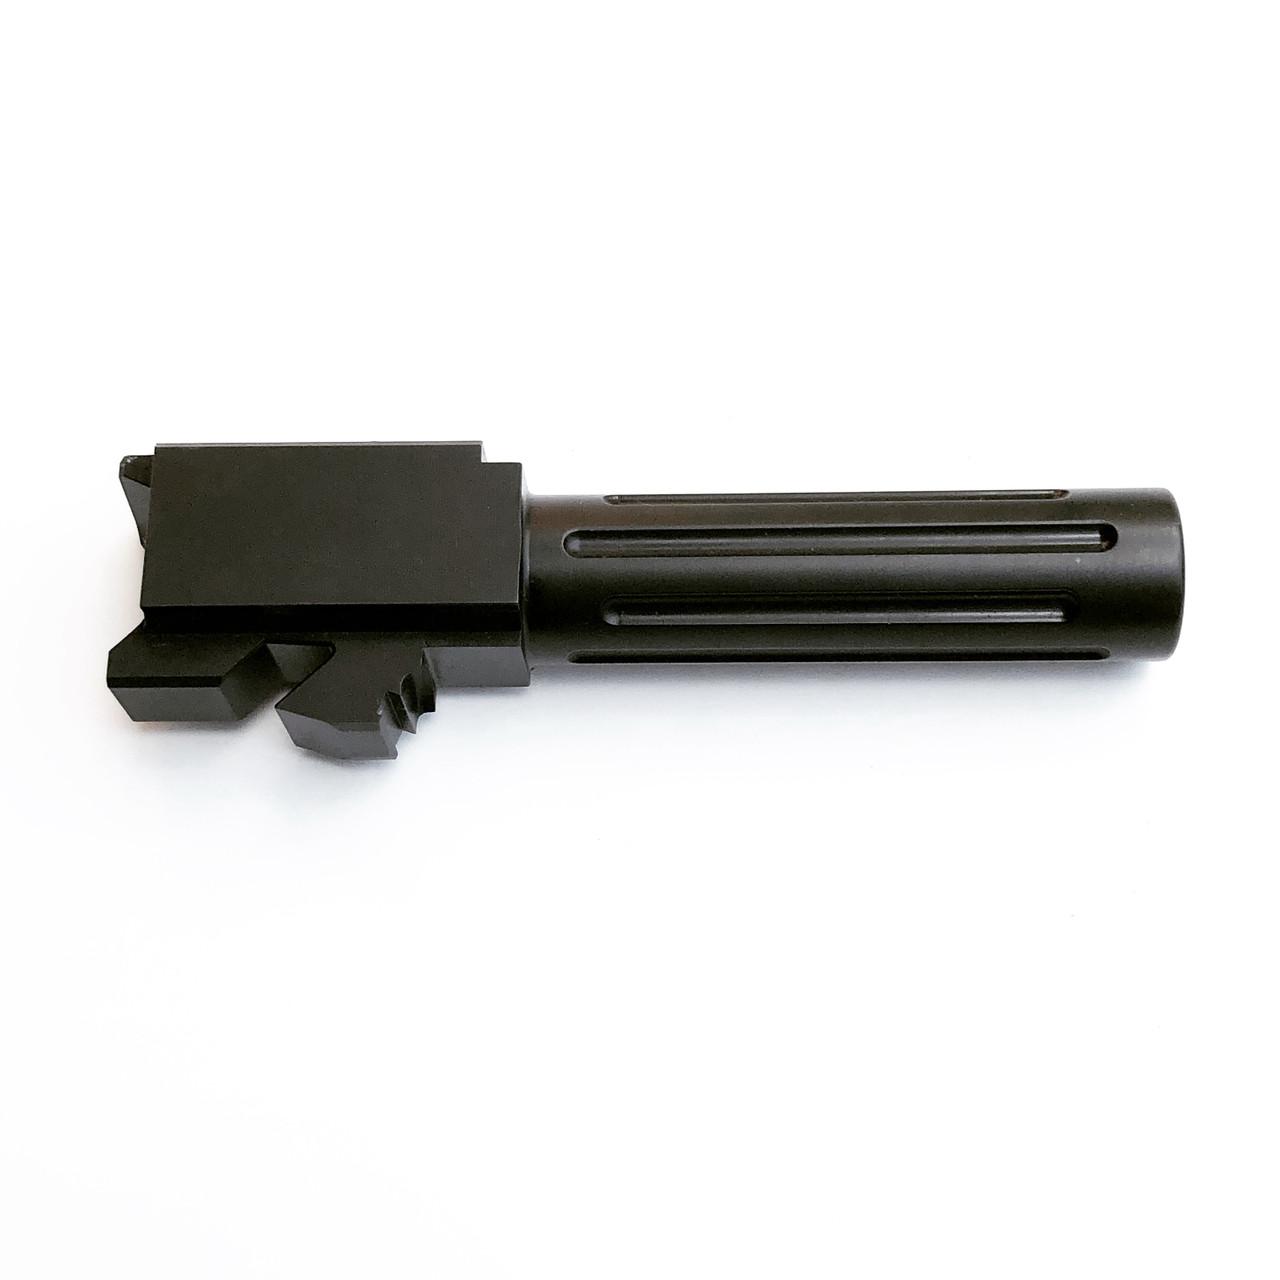 G26 Black Nitride Fluted Barrel for Glock 26 9mm Stock Length Made in USA